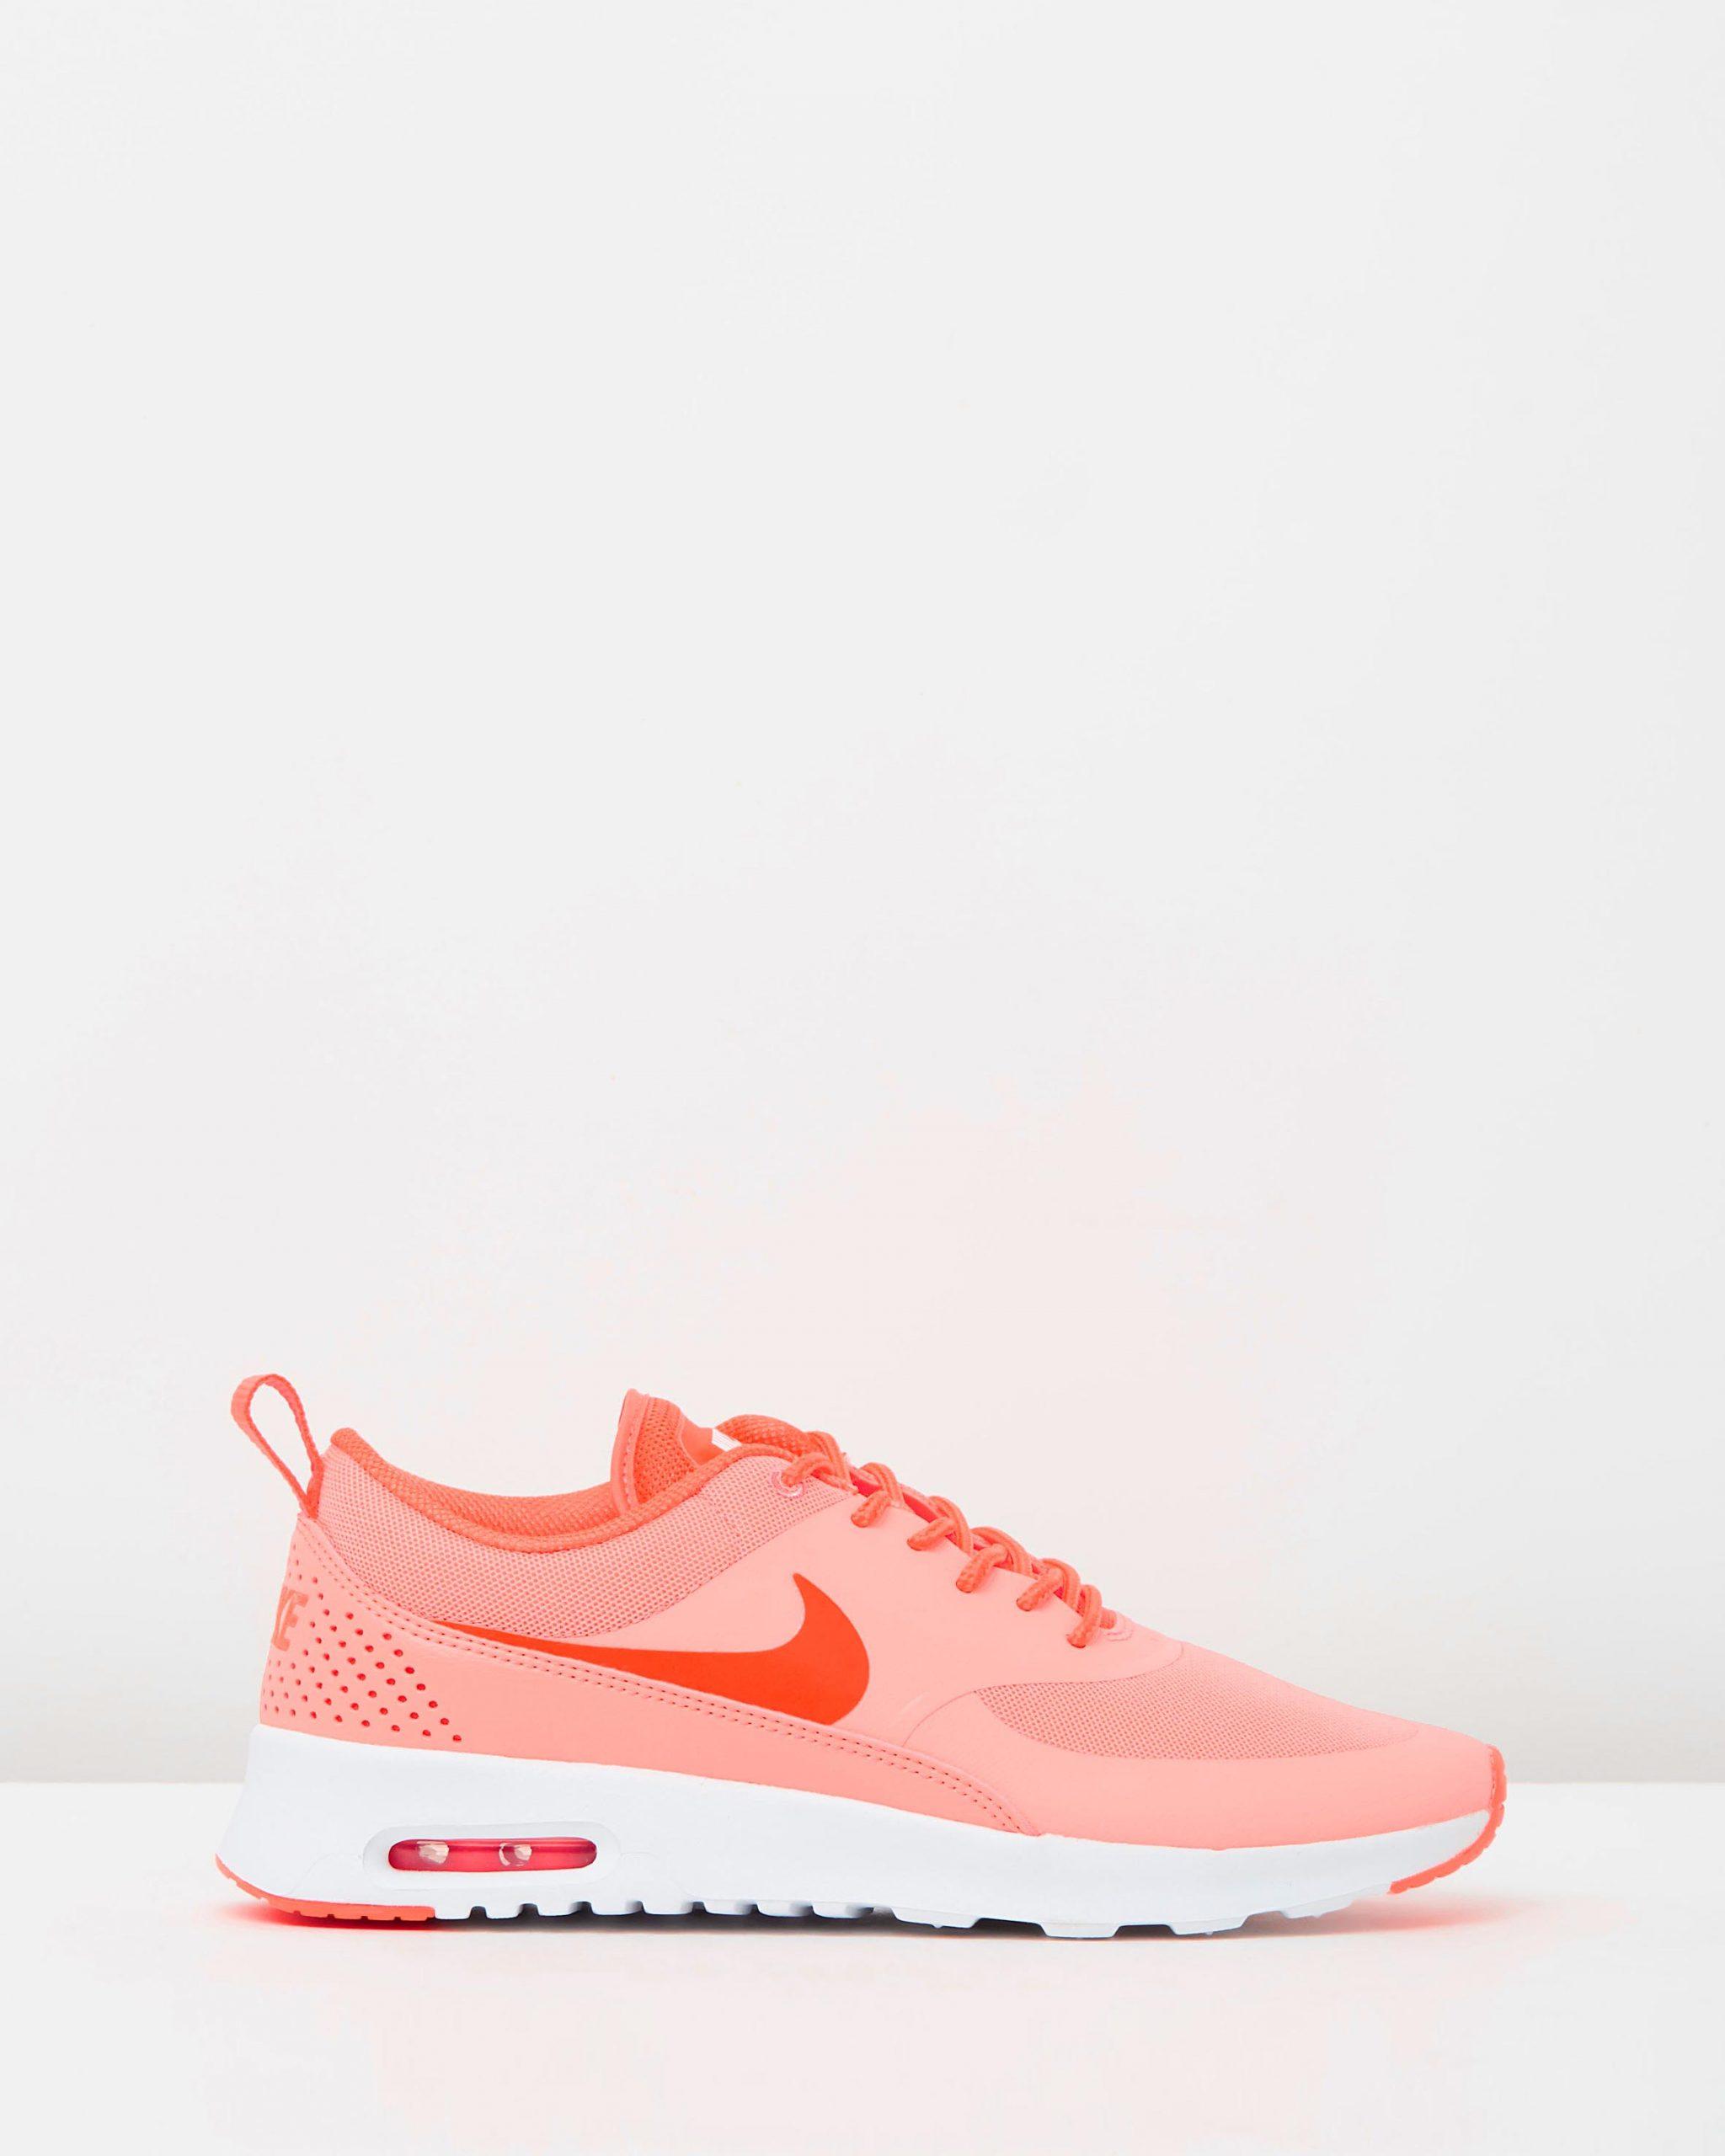 Women's Nike Air Max Thea Atomic Pink